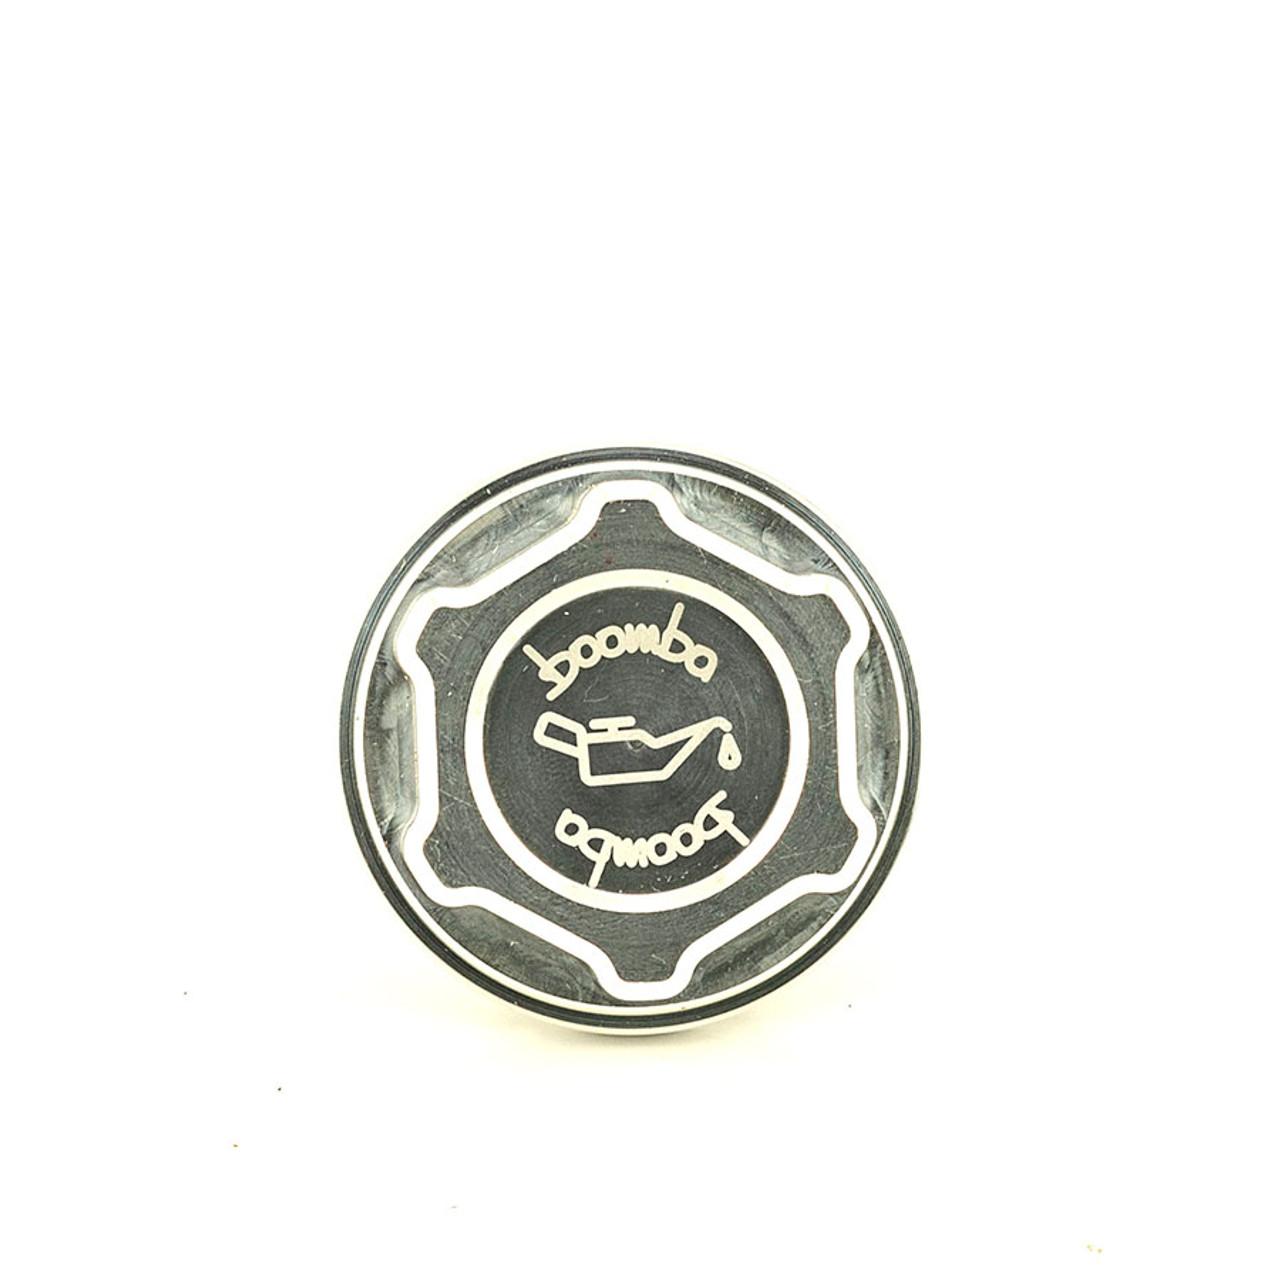 Veloster/Elantra/Forte Oil Cap